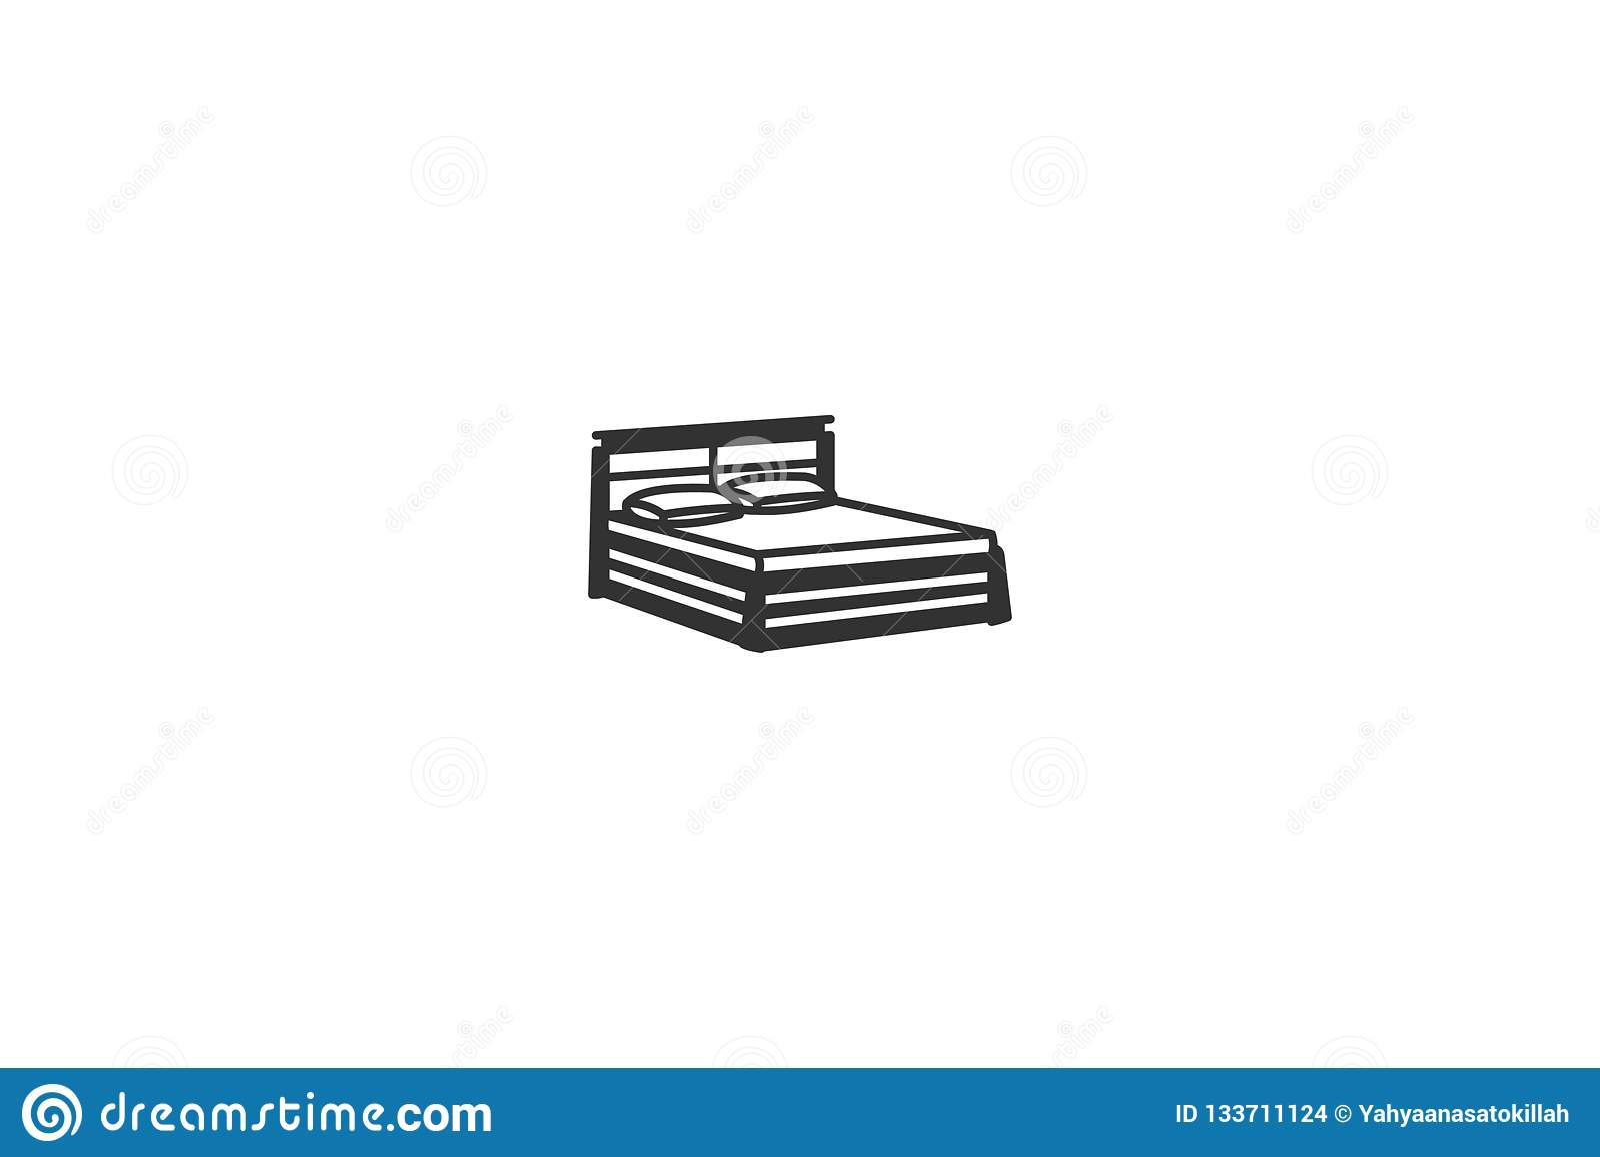 Mattress Mono Line Logo Designs Inspiration Isolated On White Background Stock Illustration Illustration Of Beautiful Item 133711124